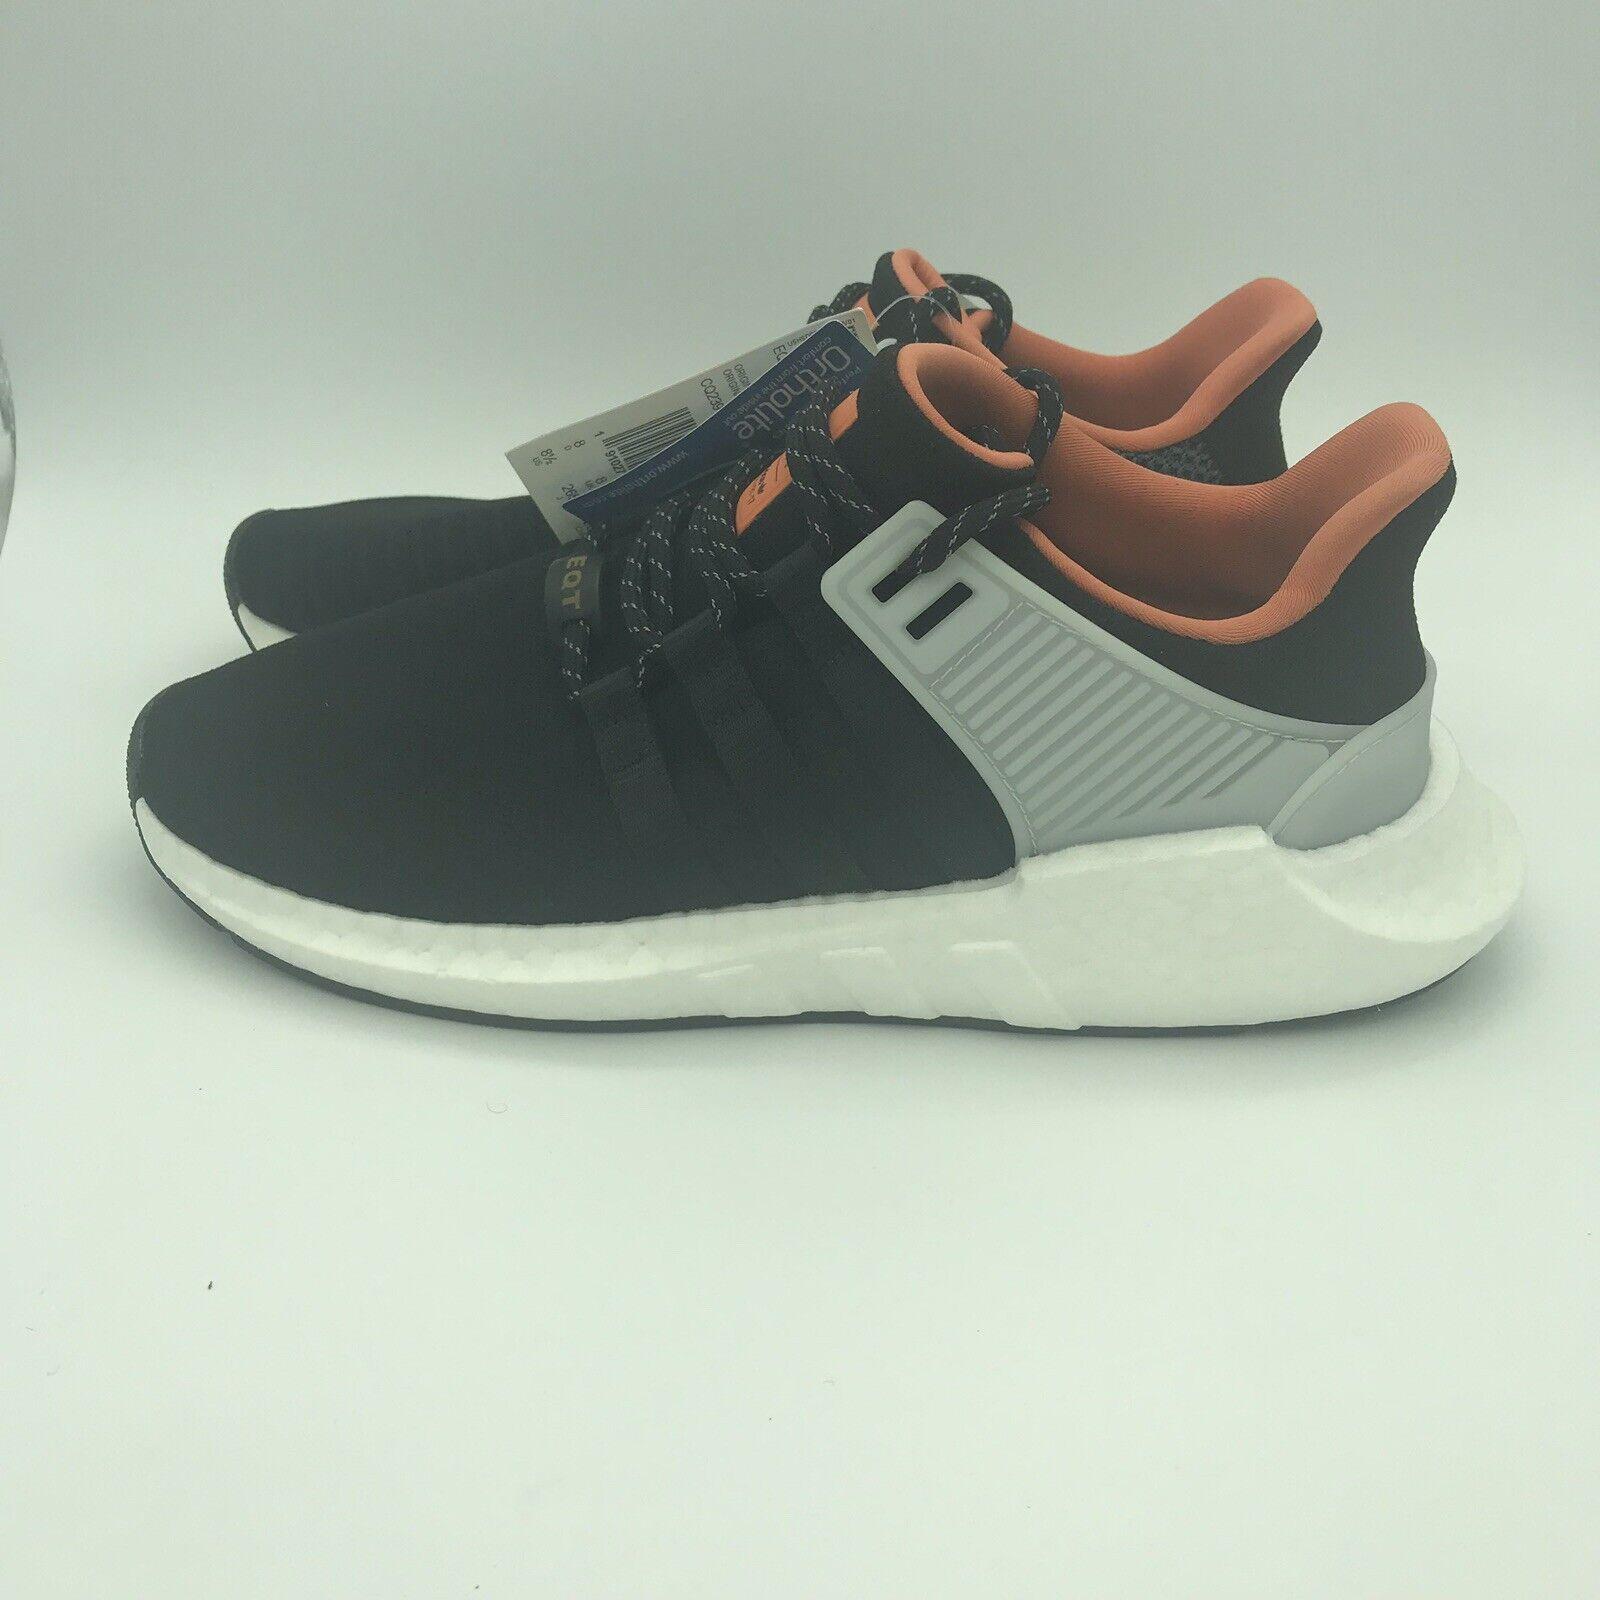 Adidas EQT Support 93 17 Men's 8.5 Boost Primeknit CQ2396 Welding Black orange